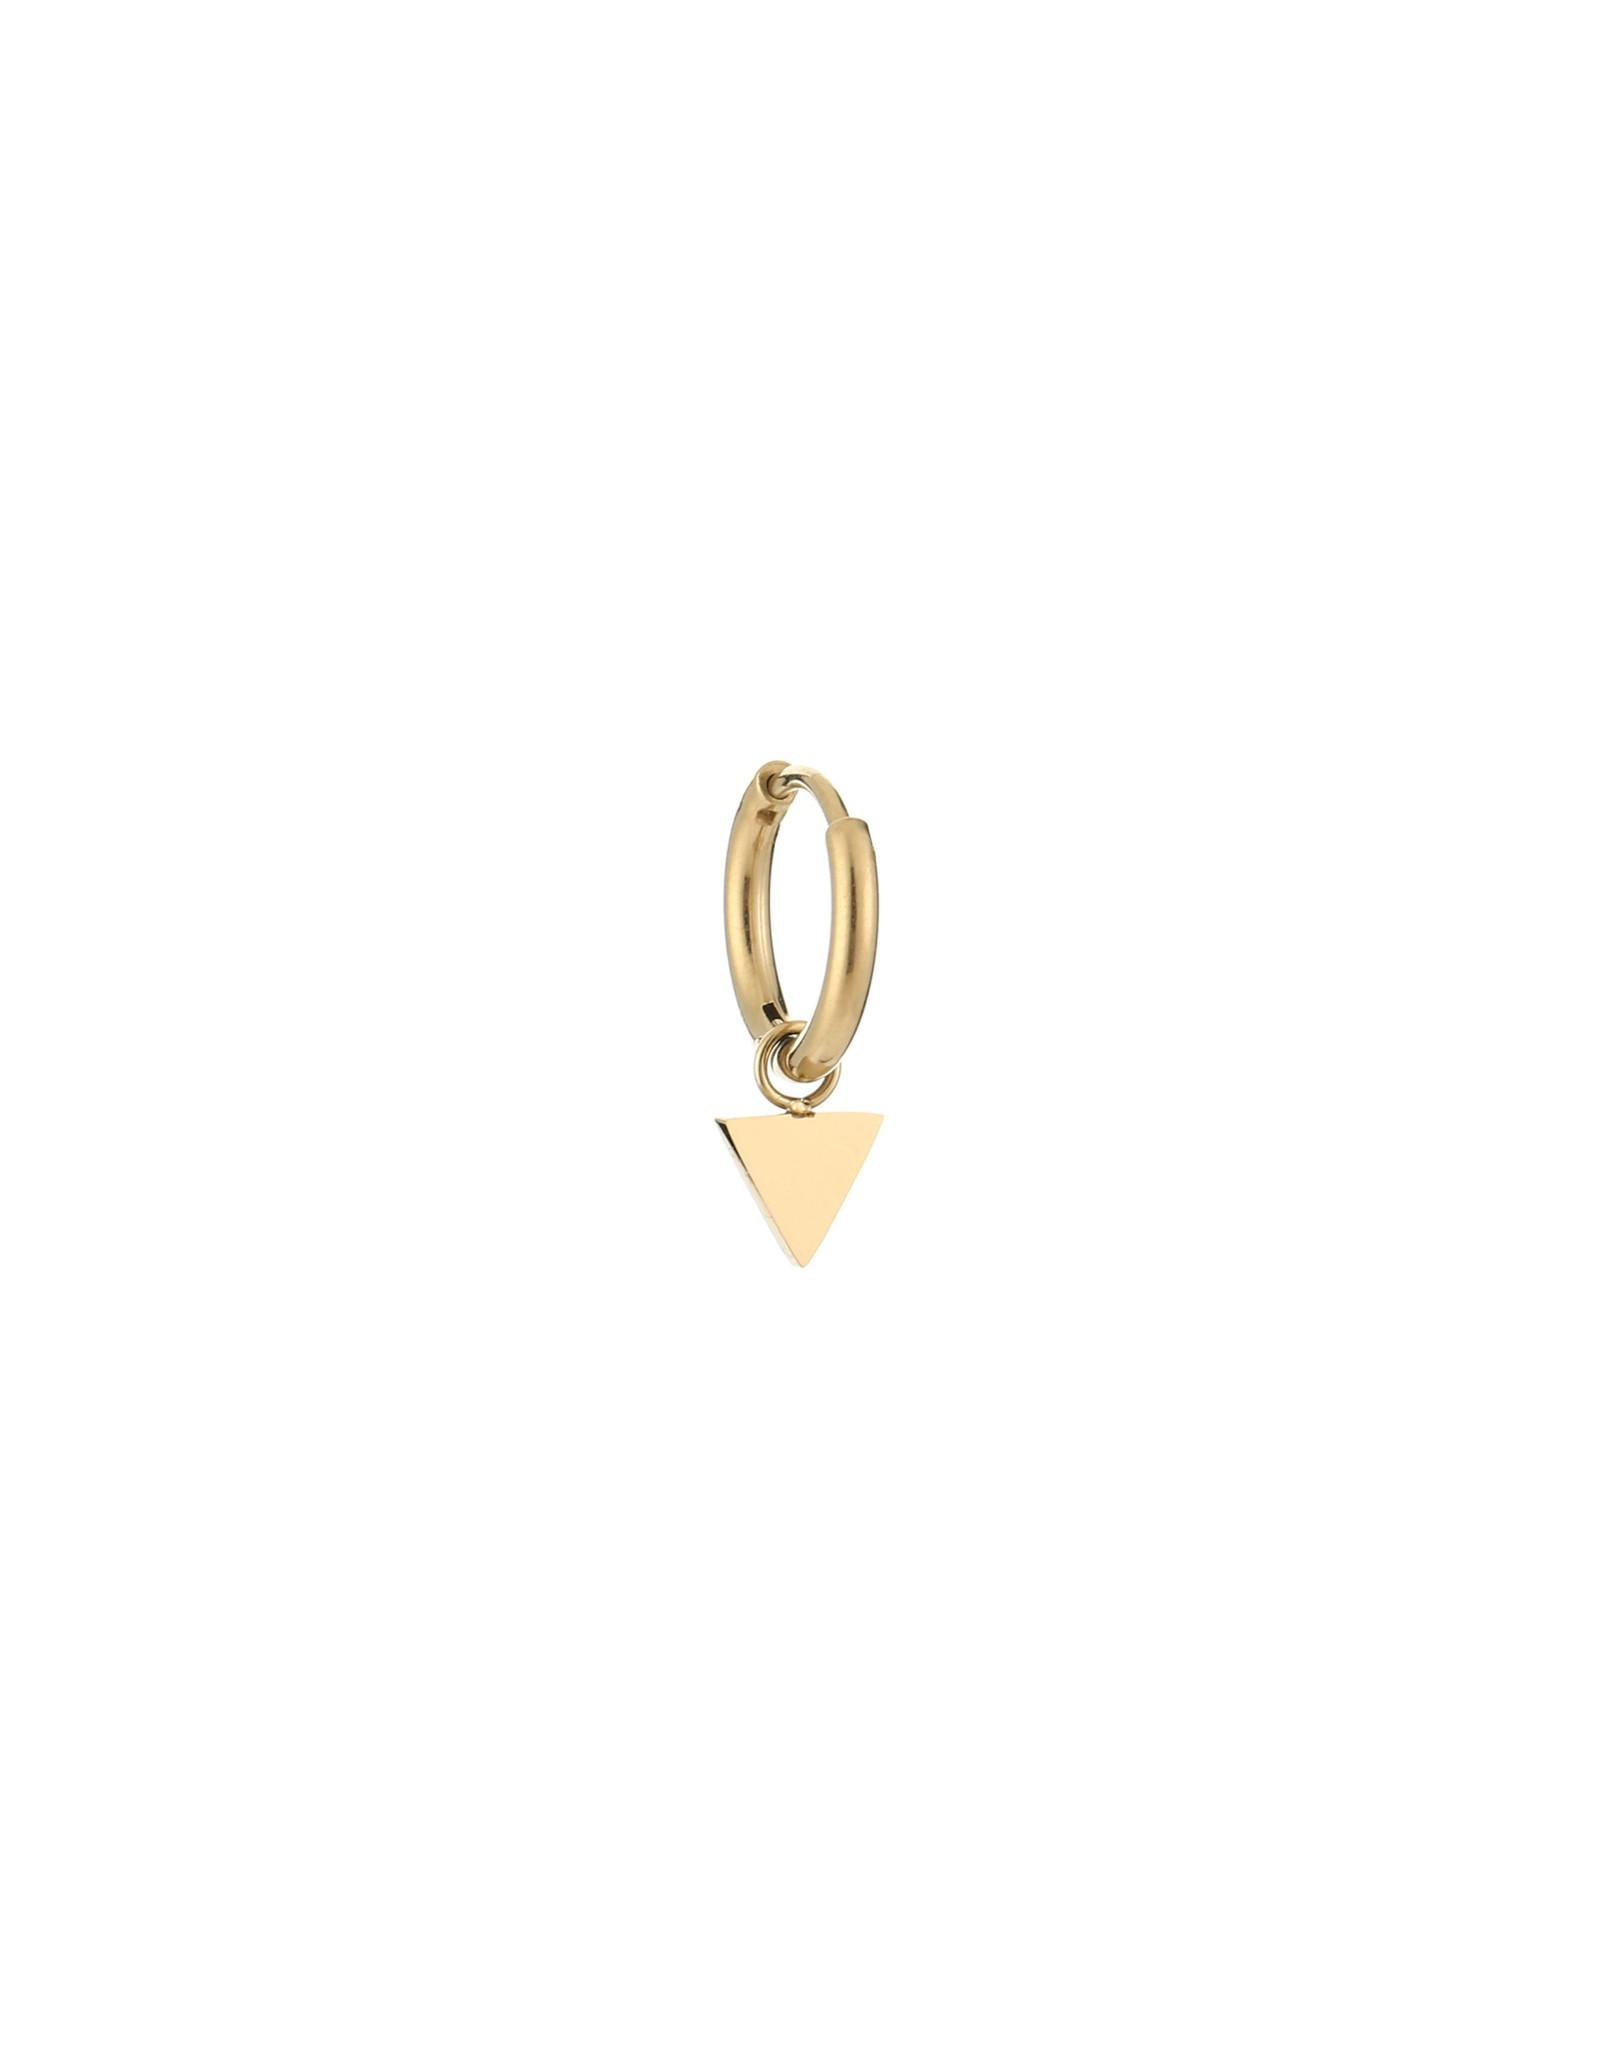 Creool RVS 10mm driehoek goudkleurig 1 stuk